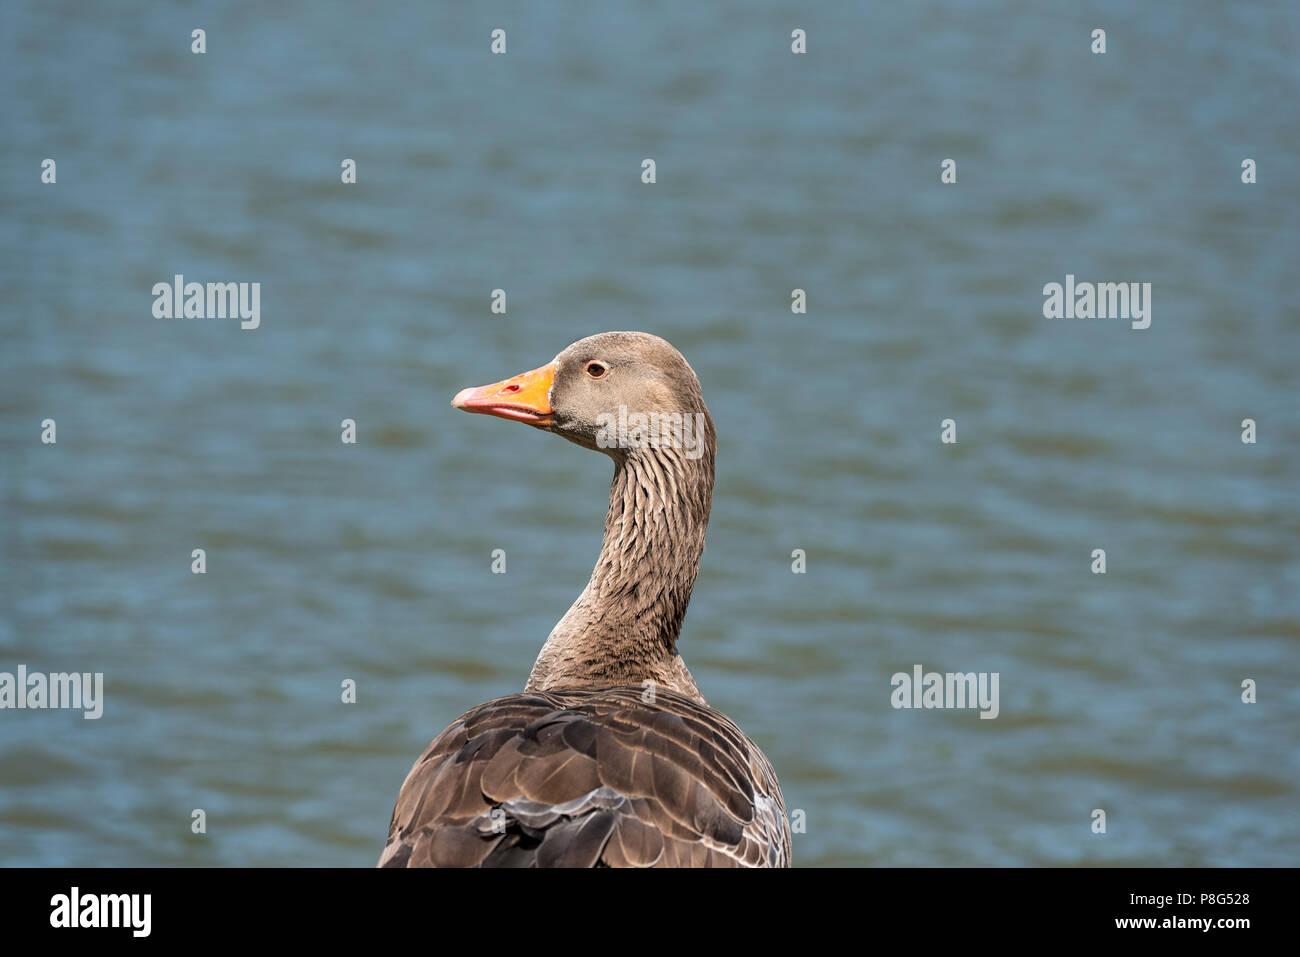 Greylag goose, anser anser, anatidae, anserifomes.Waterfowl by a UK lake. - Stock Image